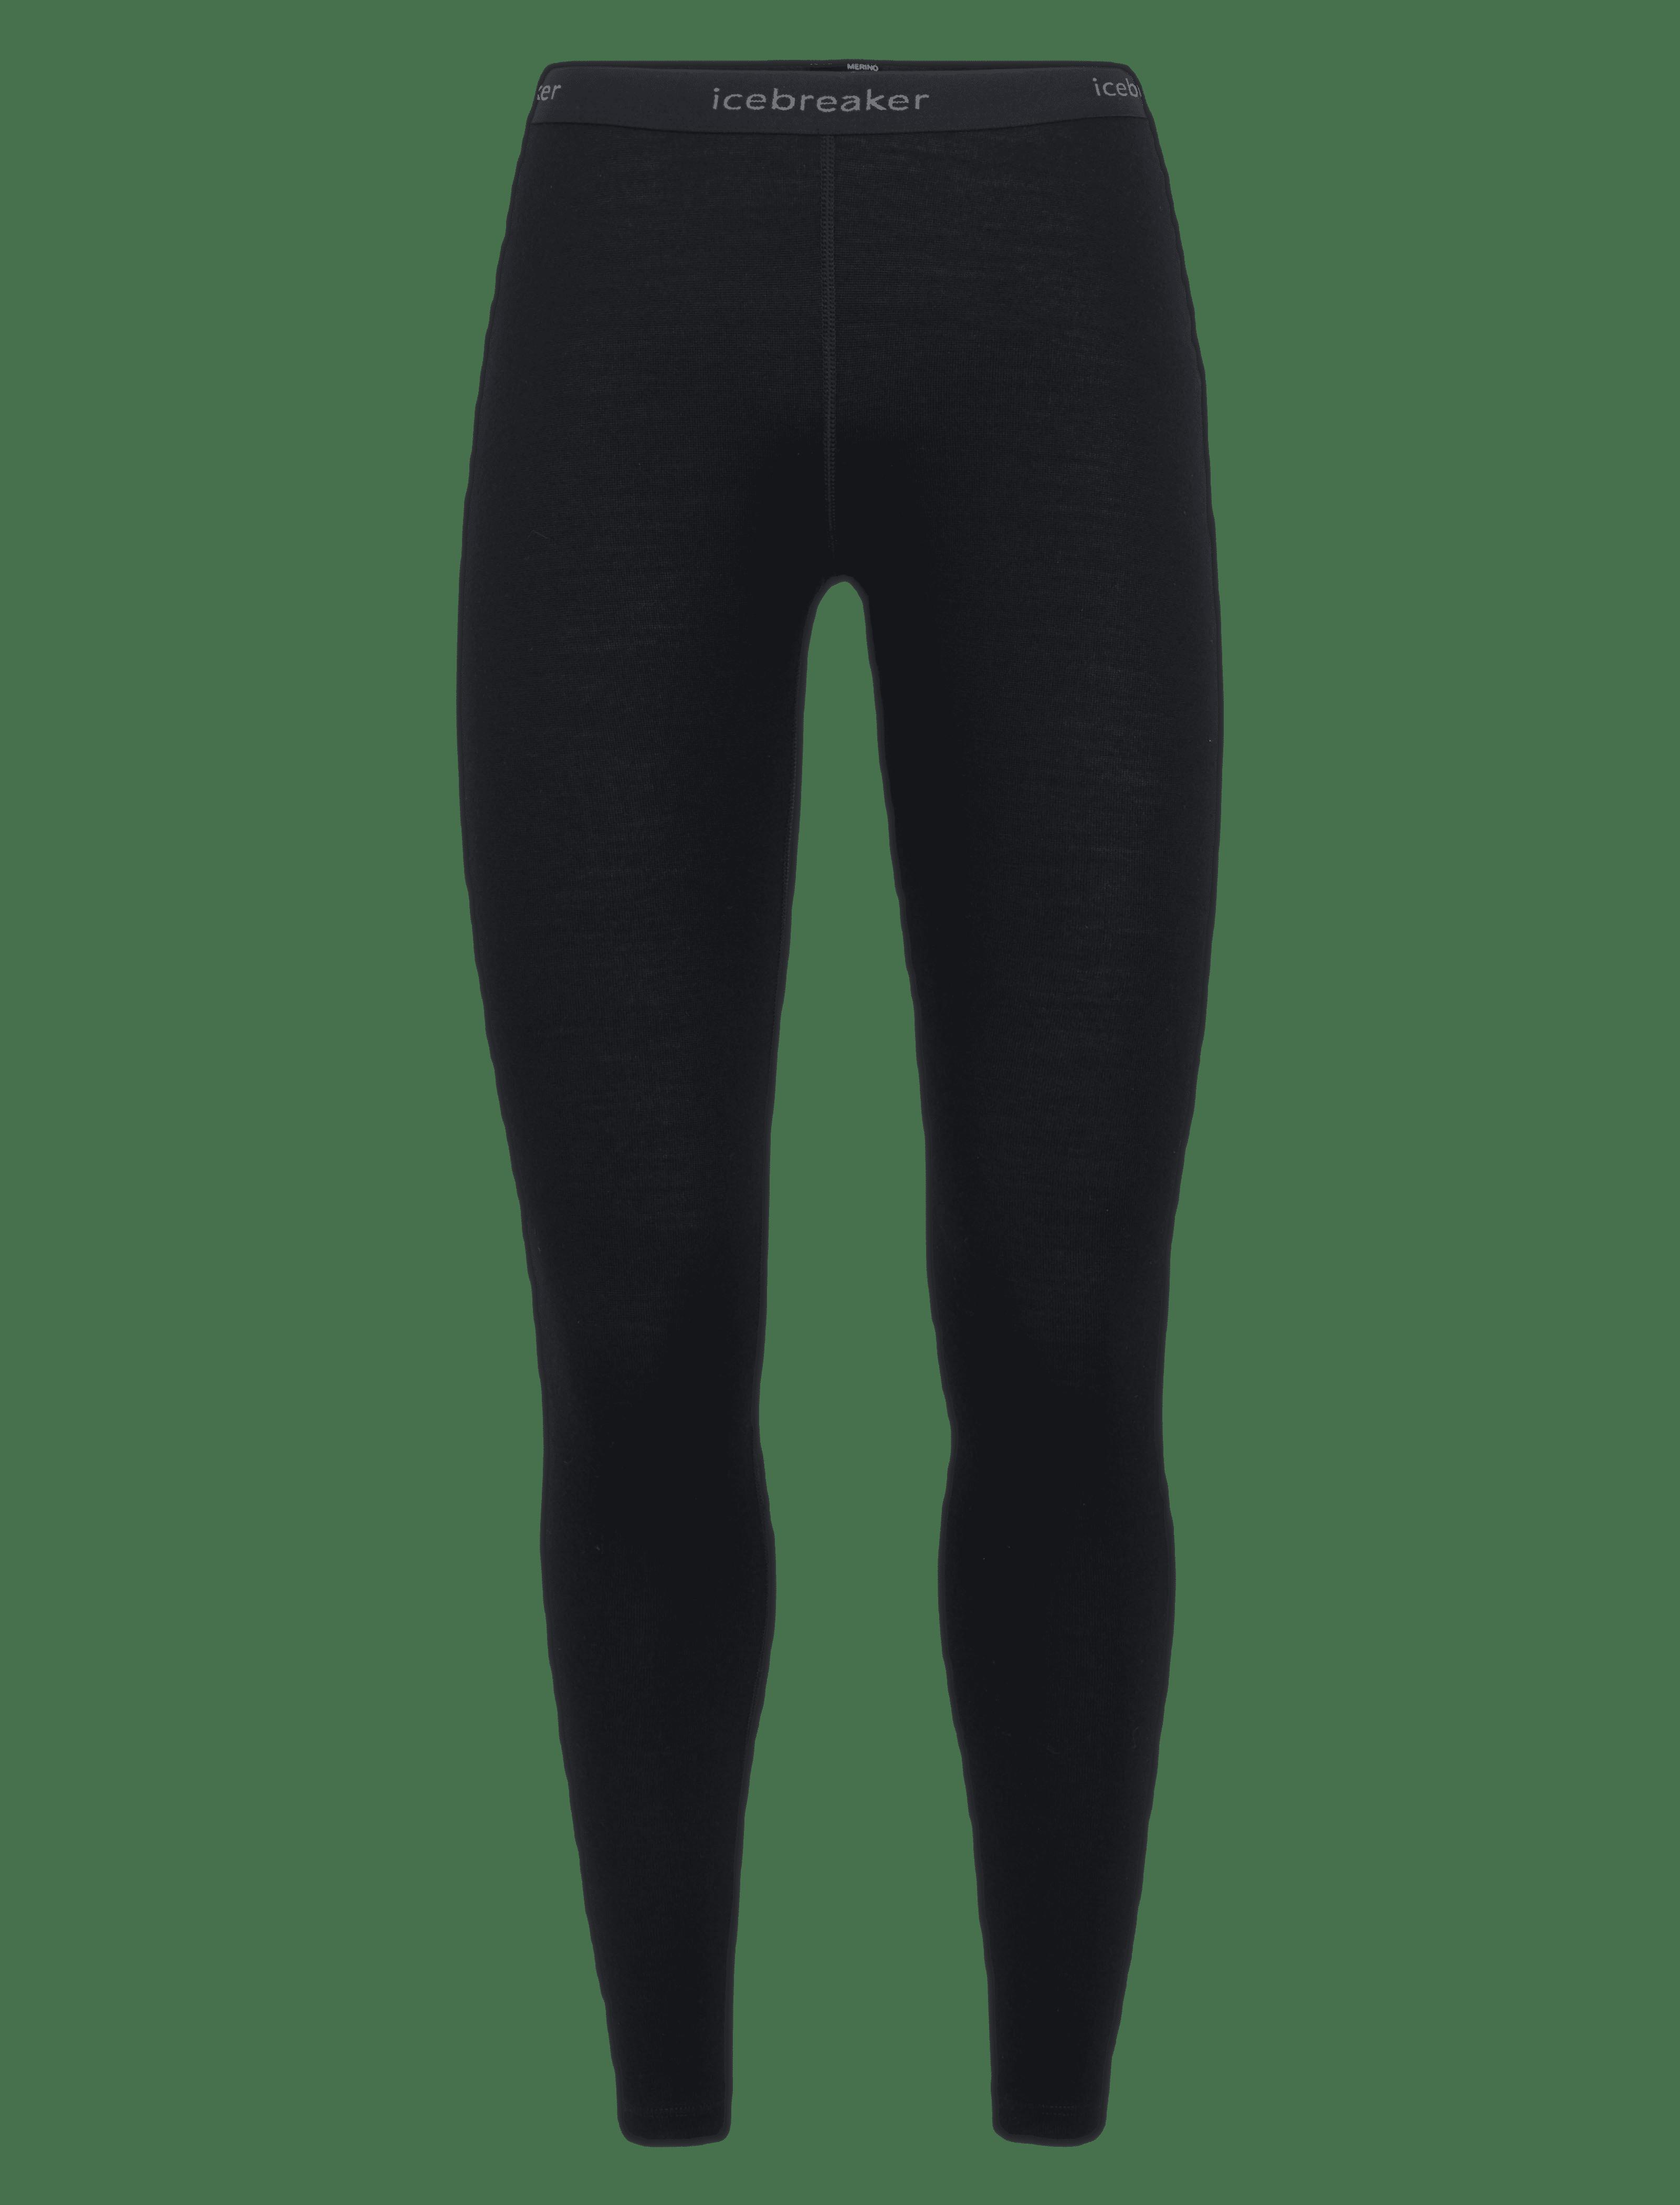 260 tech legging